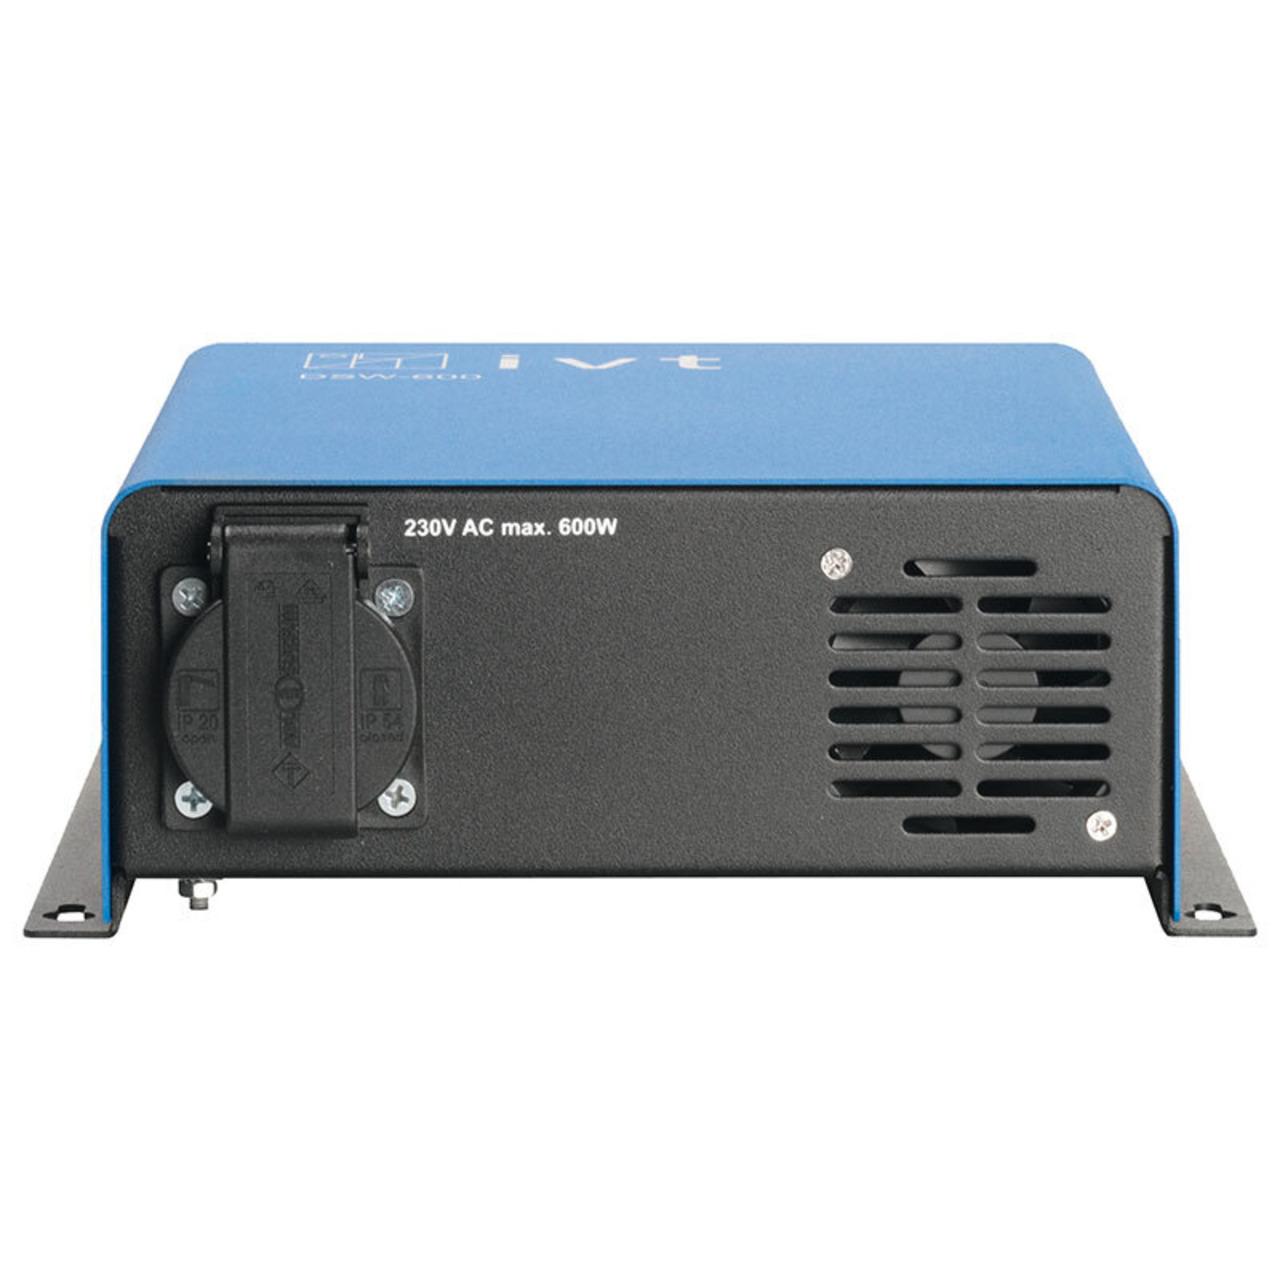 IVT Digitaler Sinus Wechselrichter DSW-600-12 V- 600VA